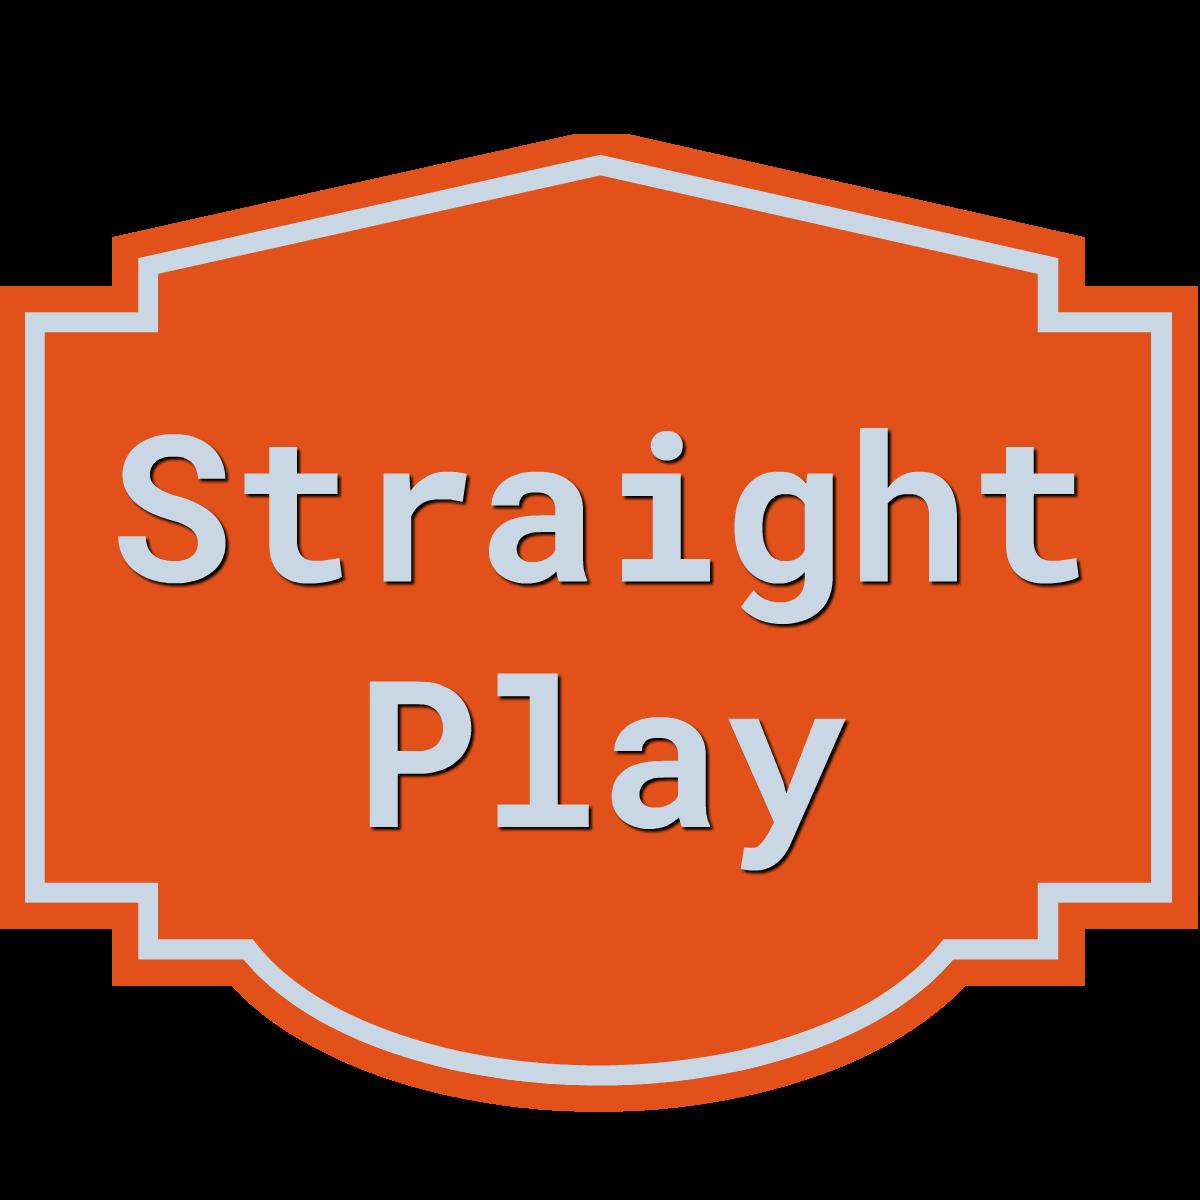 straightplay.png